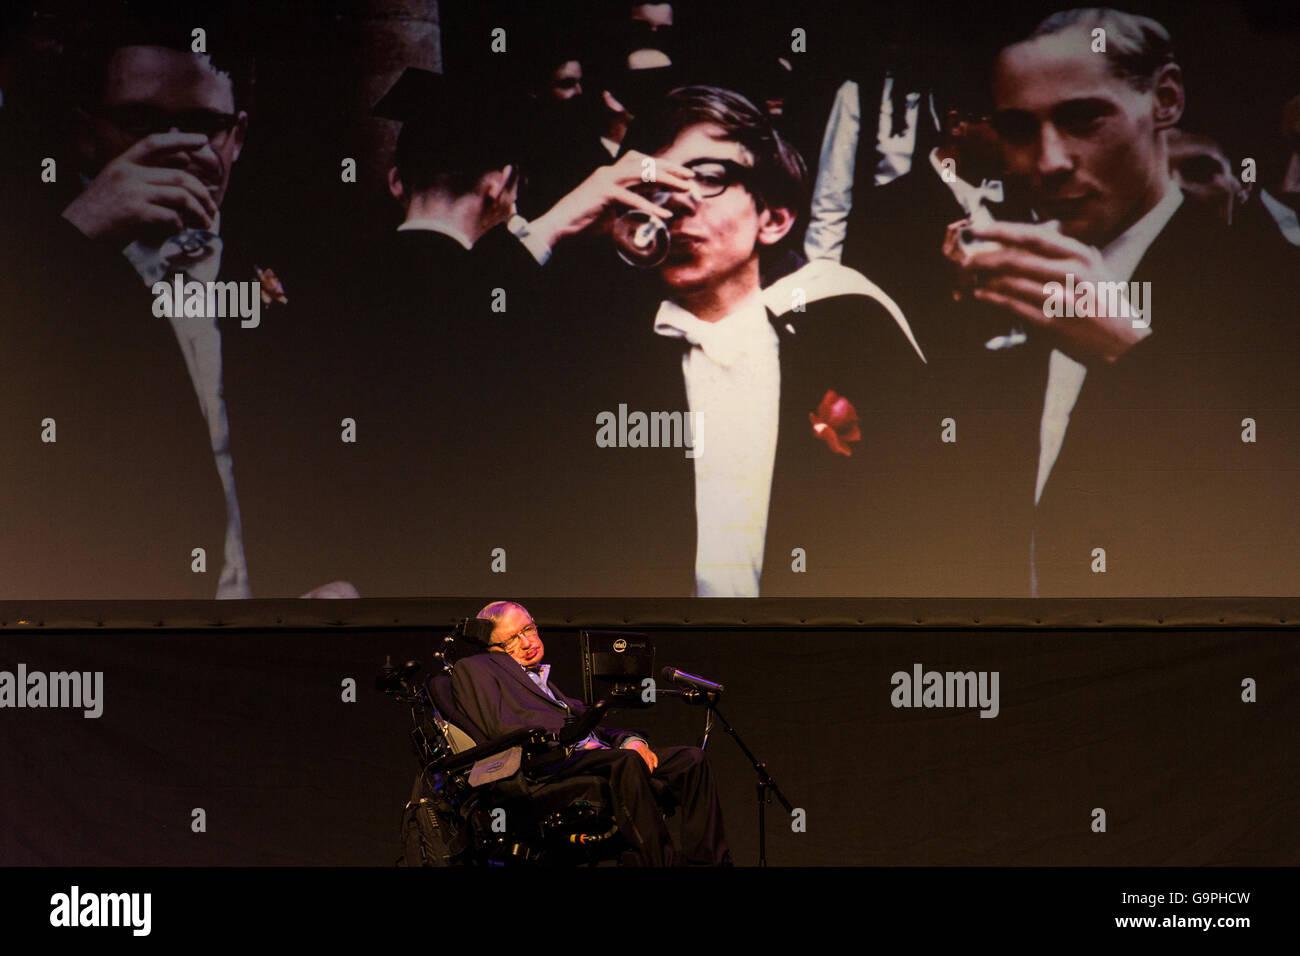 Professor Stephen Hawking speaking at the Starmus Festival 2016 in the Piramide de Arona, Las Americas, Tenerife, Stock Photo